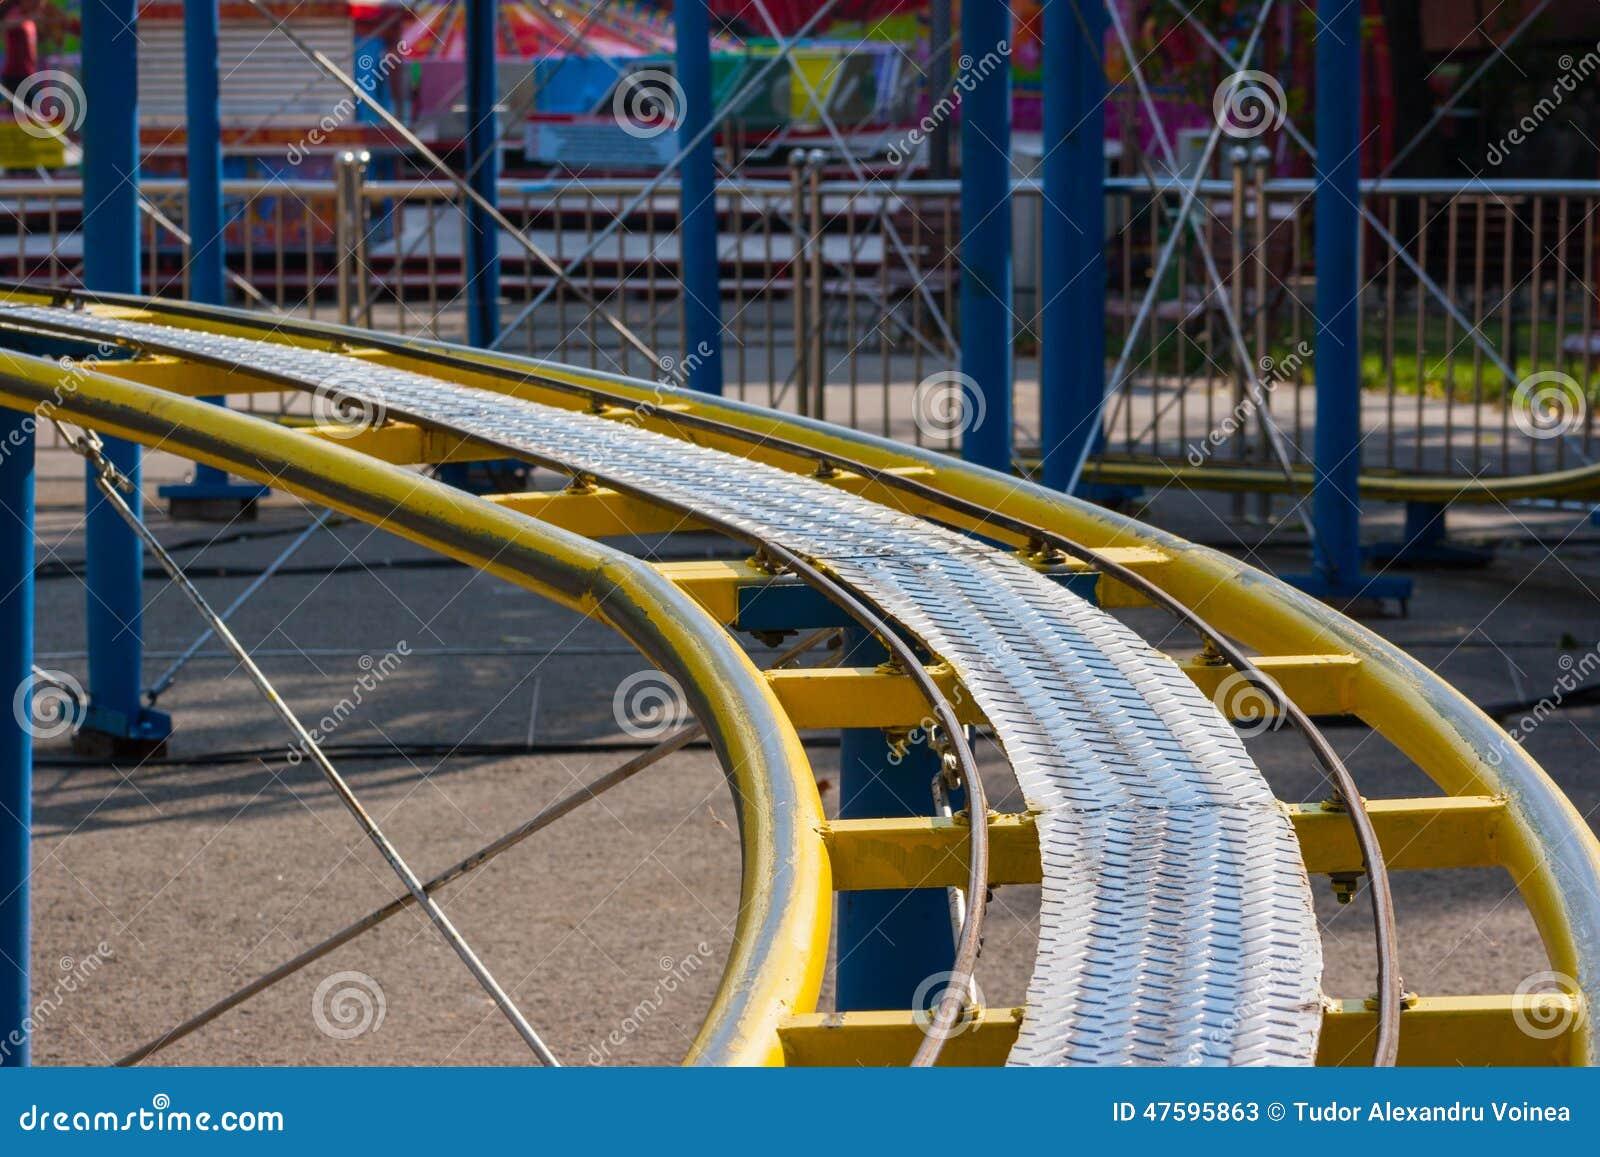 Kids roller coaster yellow rails in amusement park.